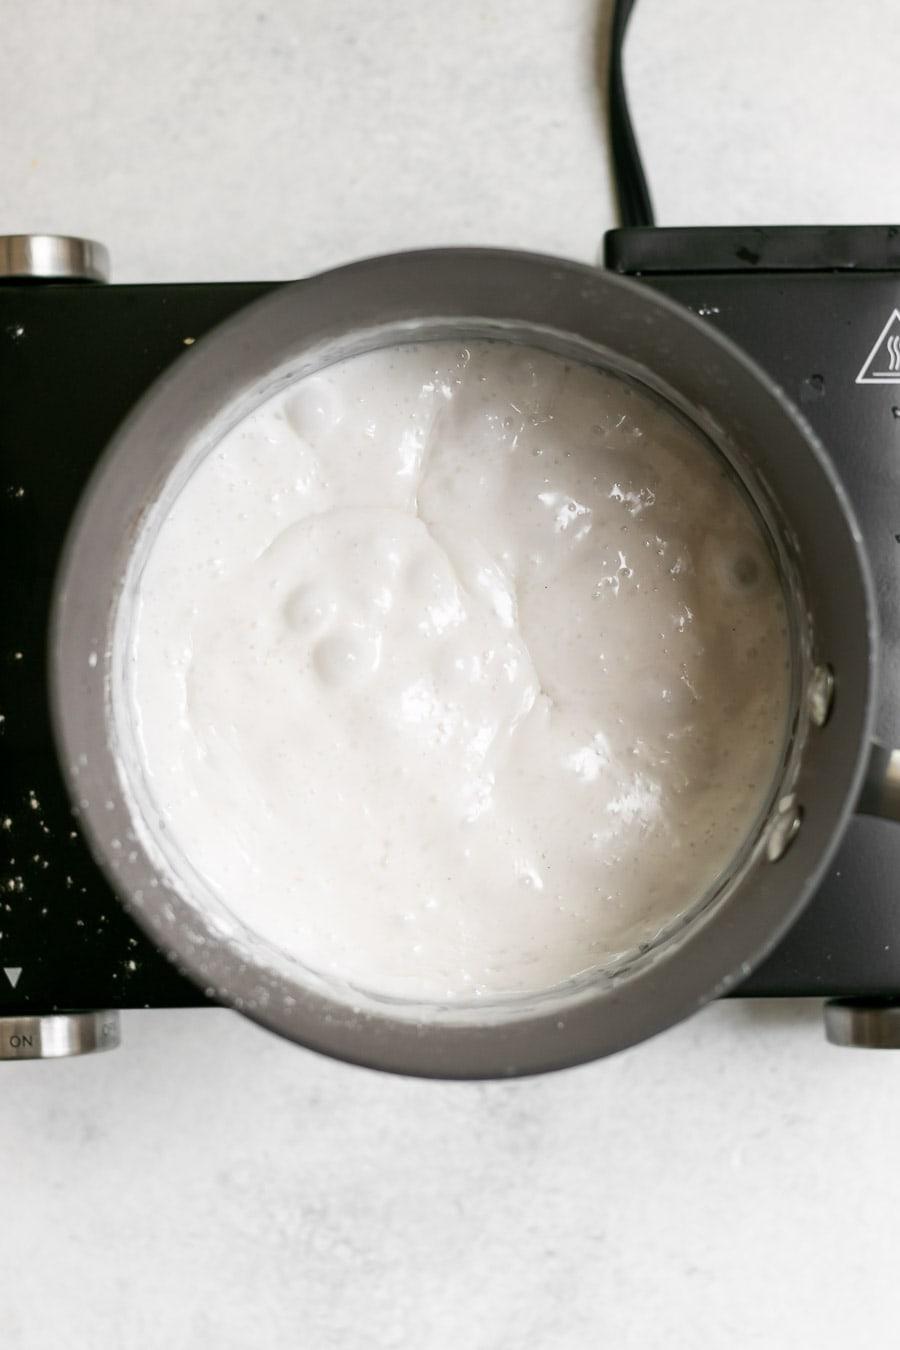 Process shot of making the recipe.